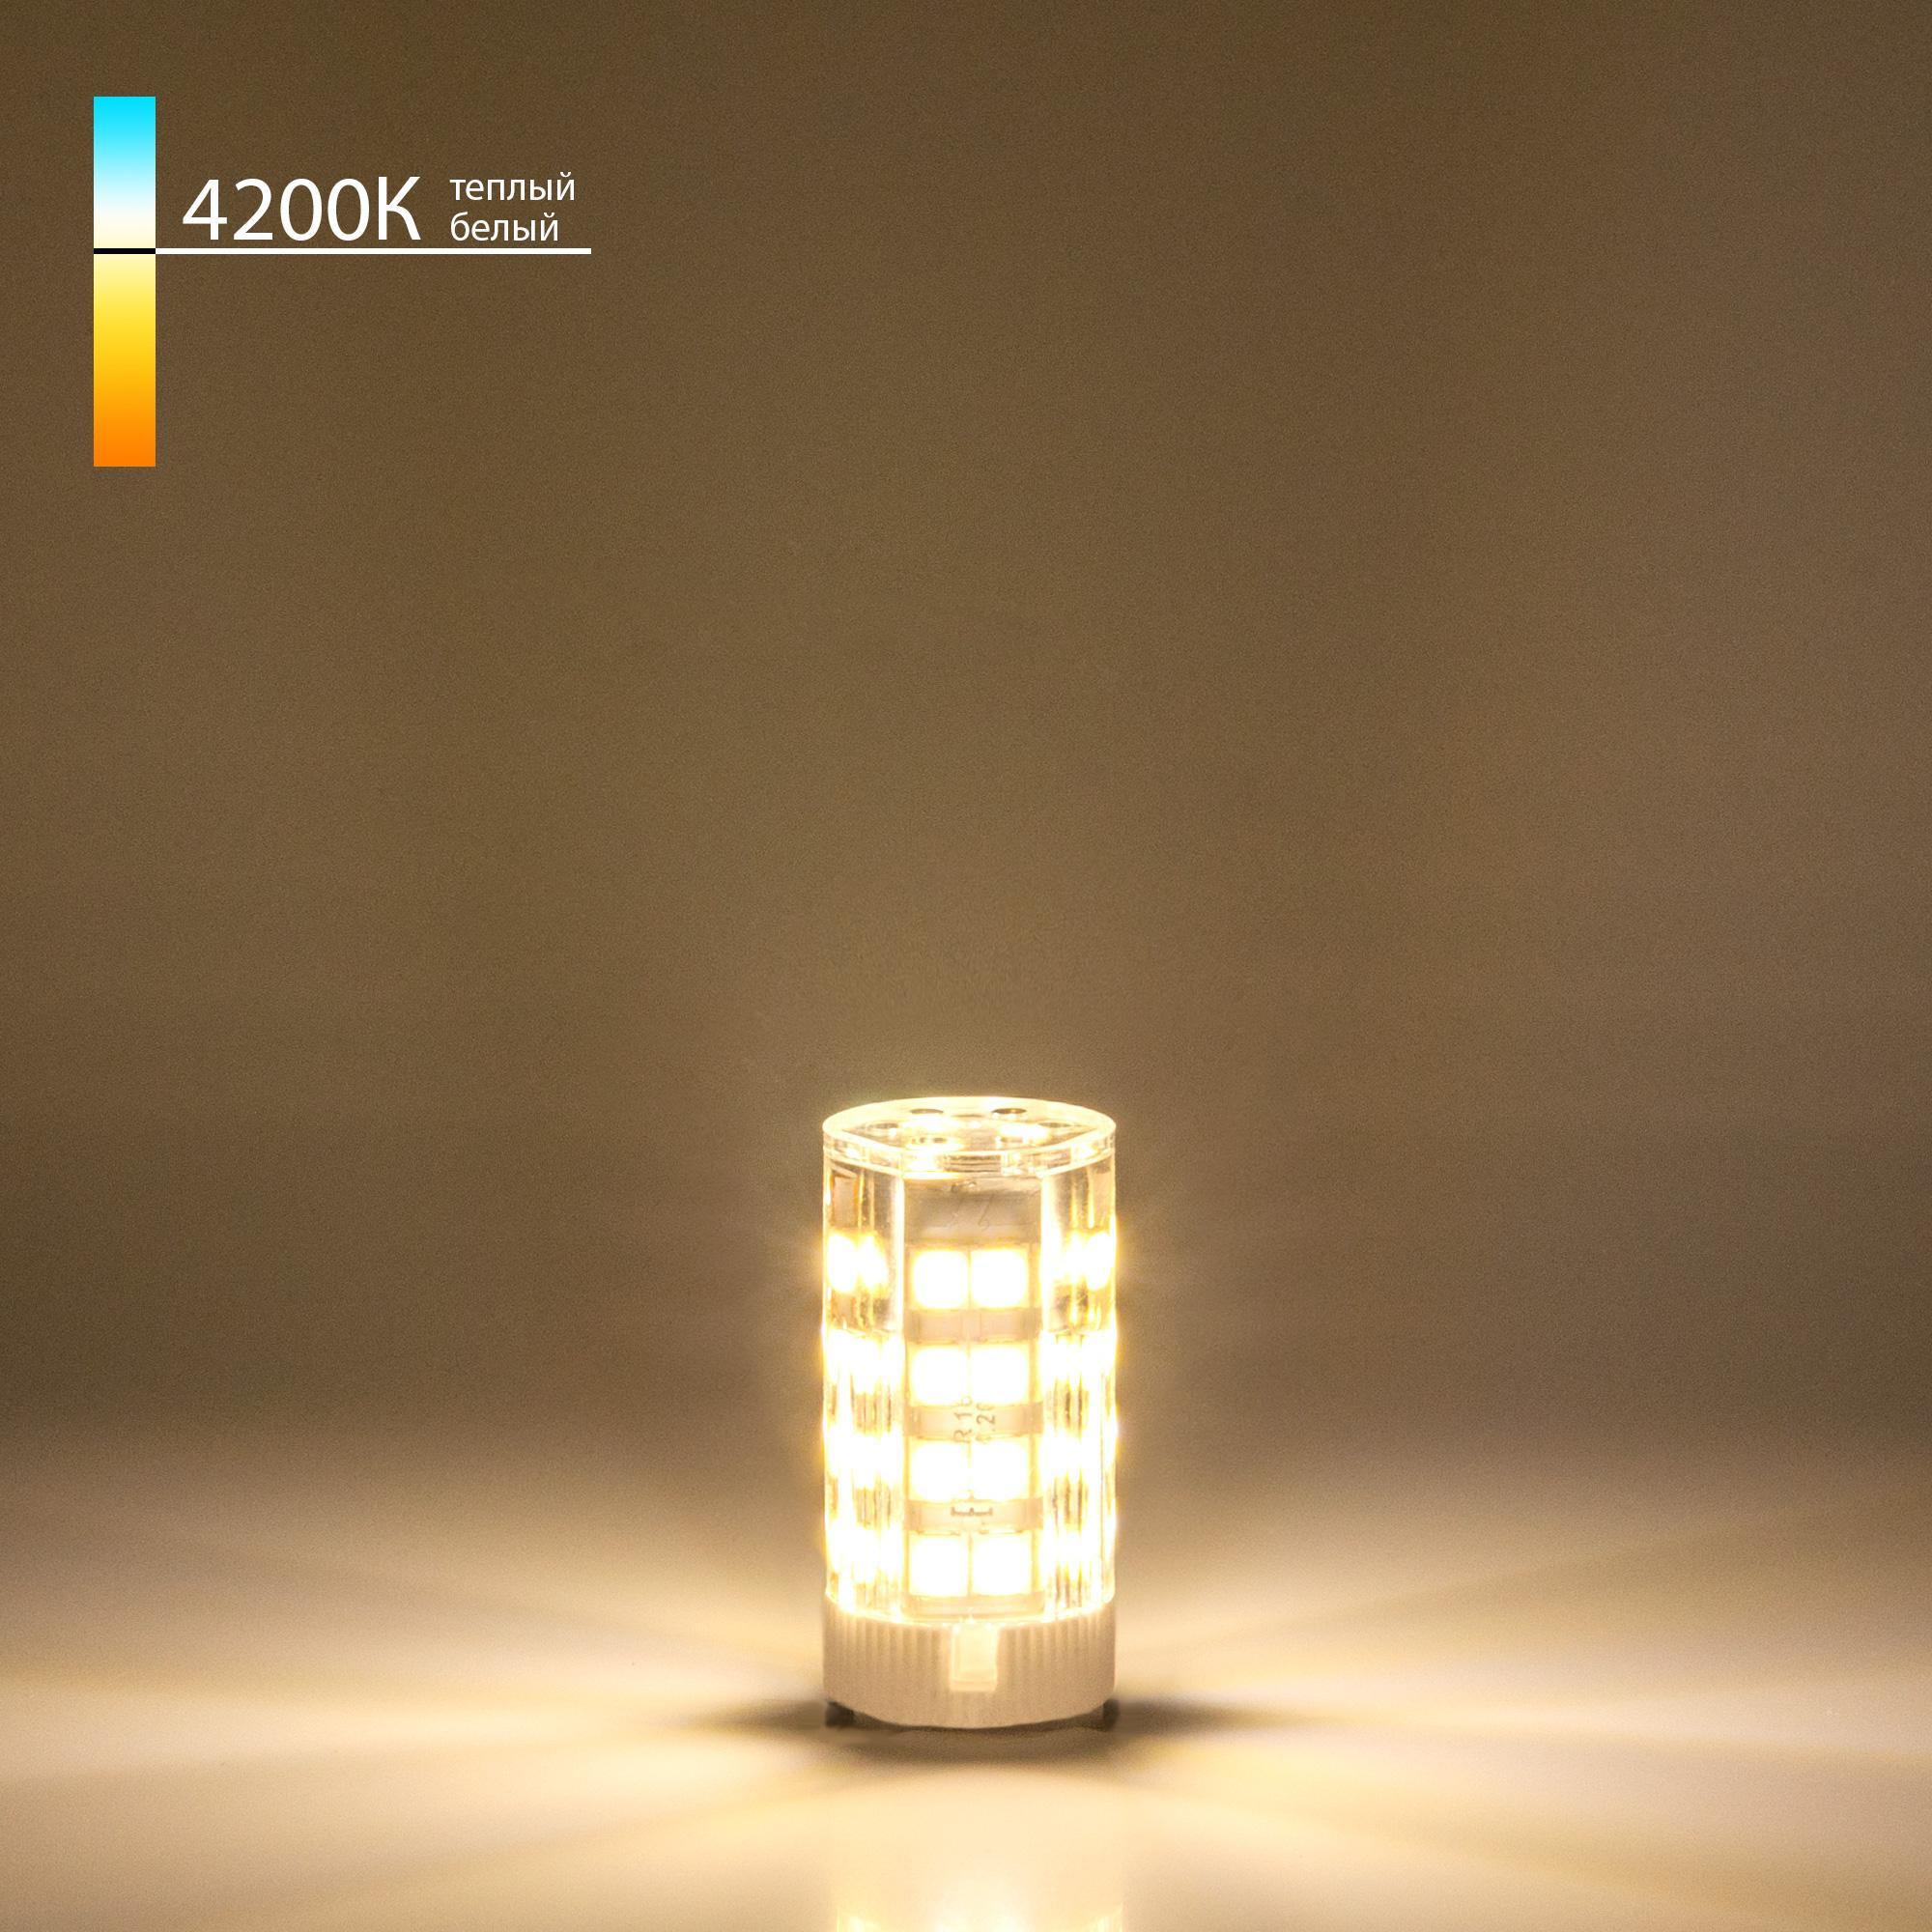 G9 LED 5W 220V 4200К